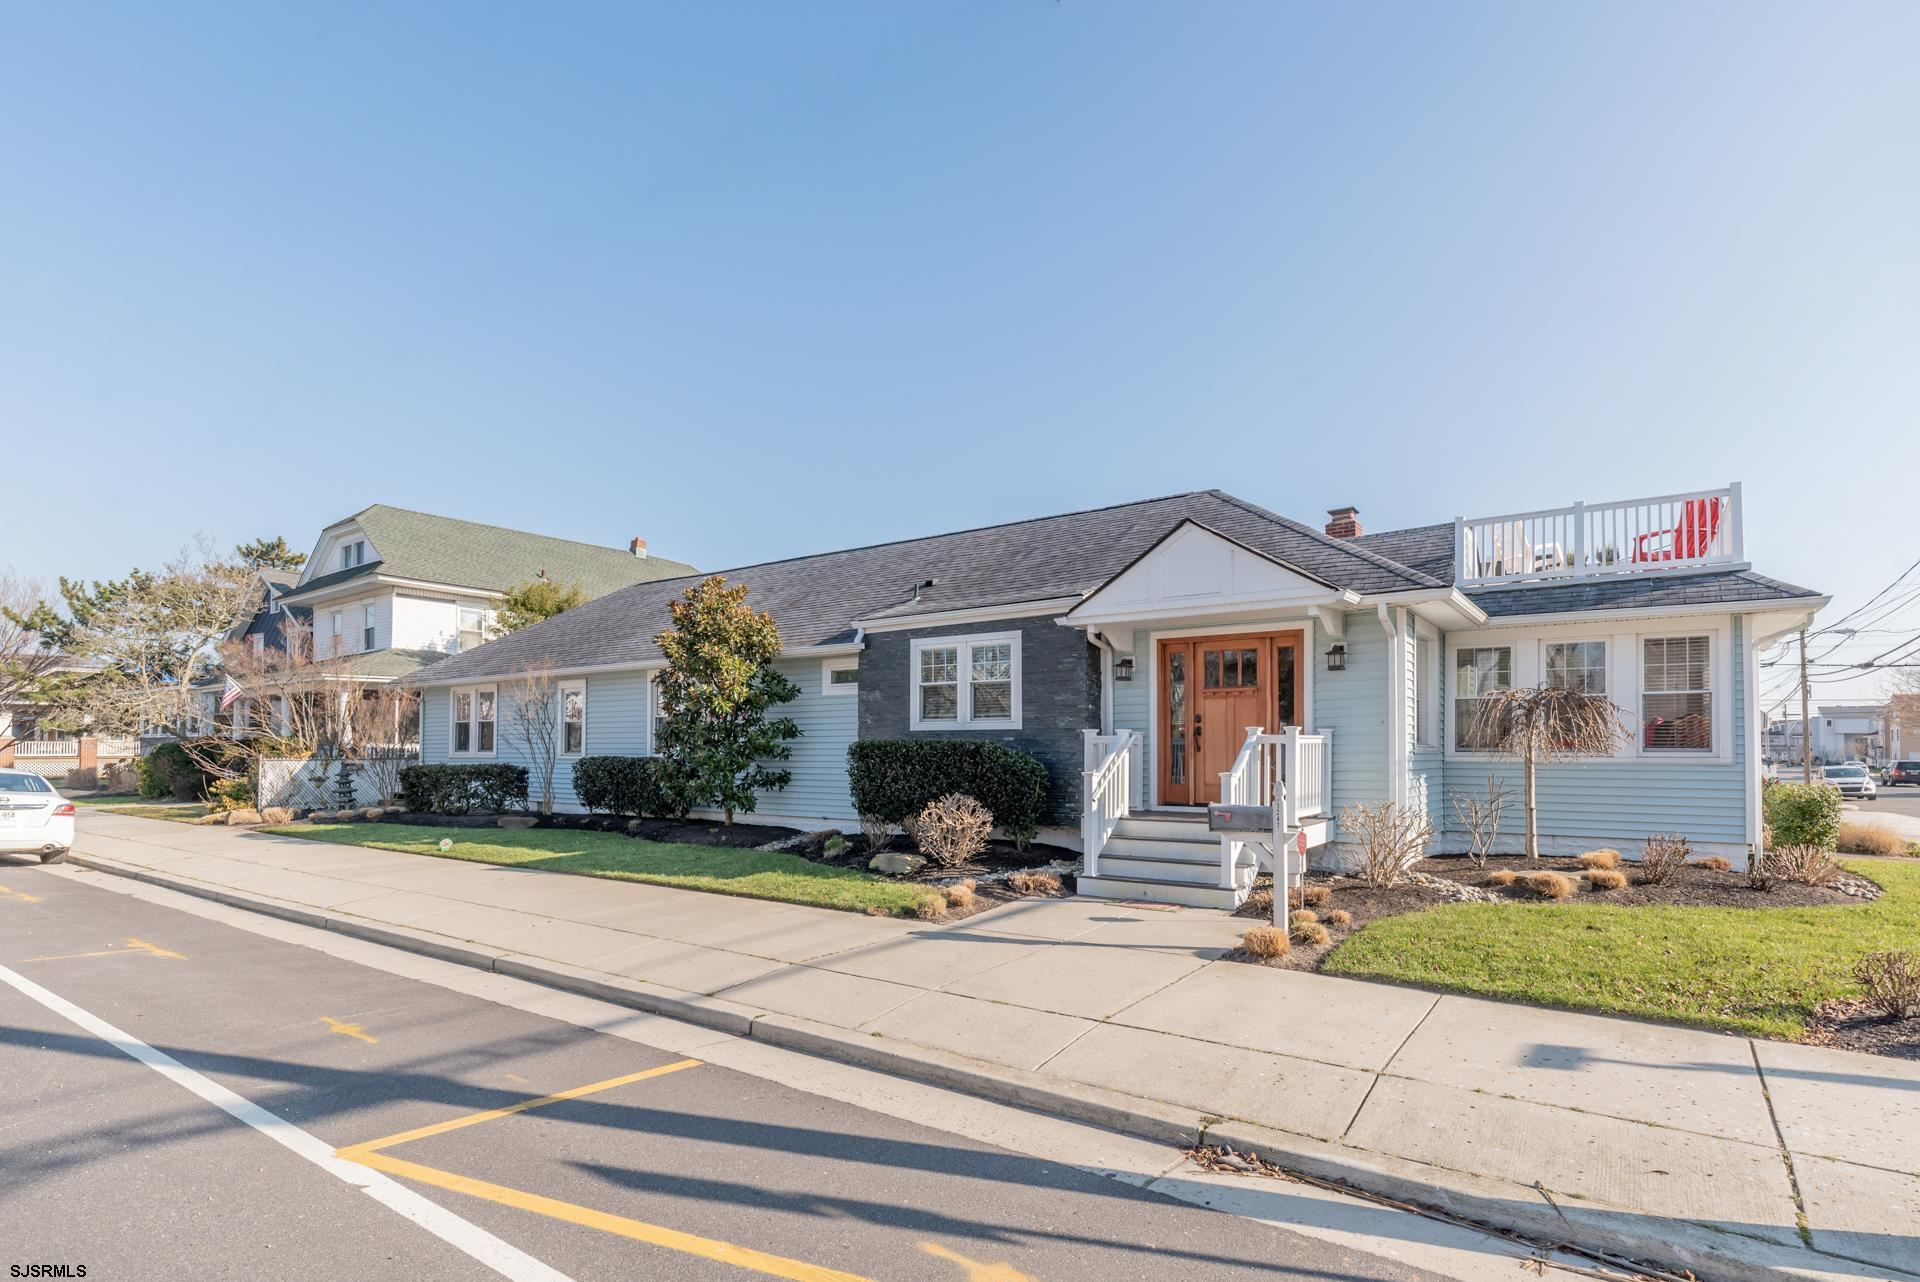 1247 Bay Ave, Ocean City, NJ 08226 - #: 550218